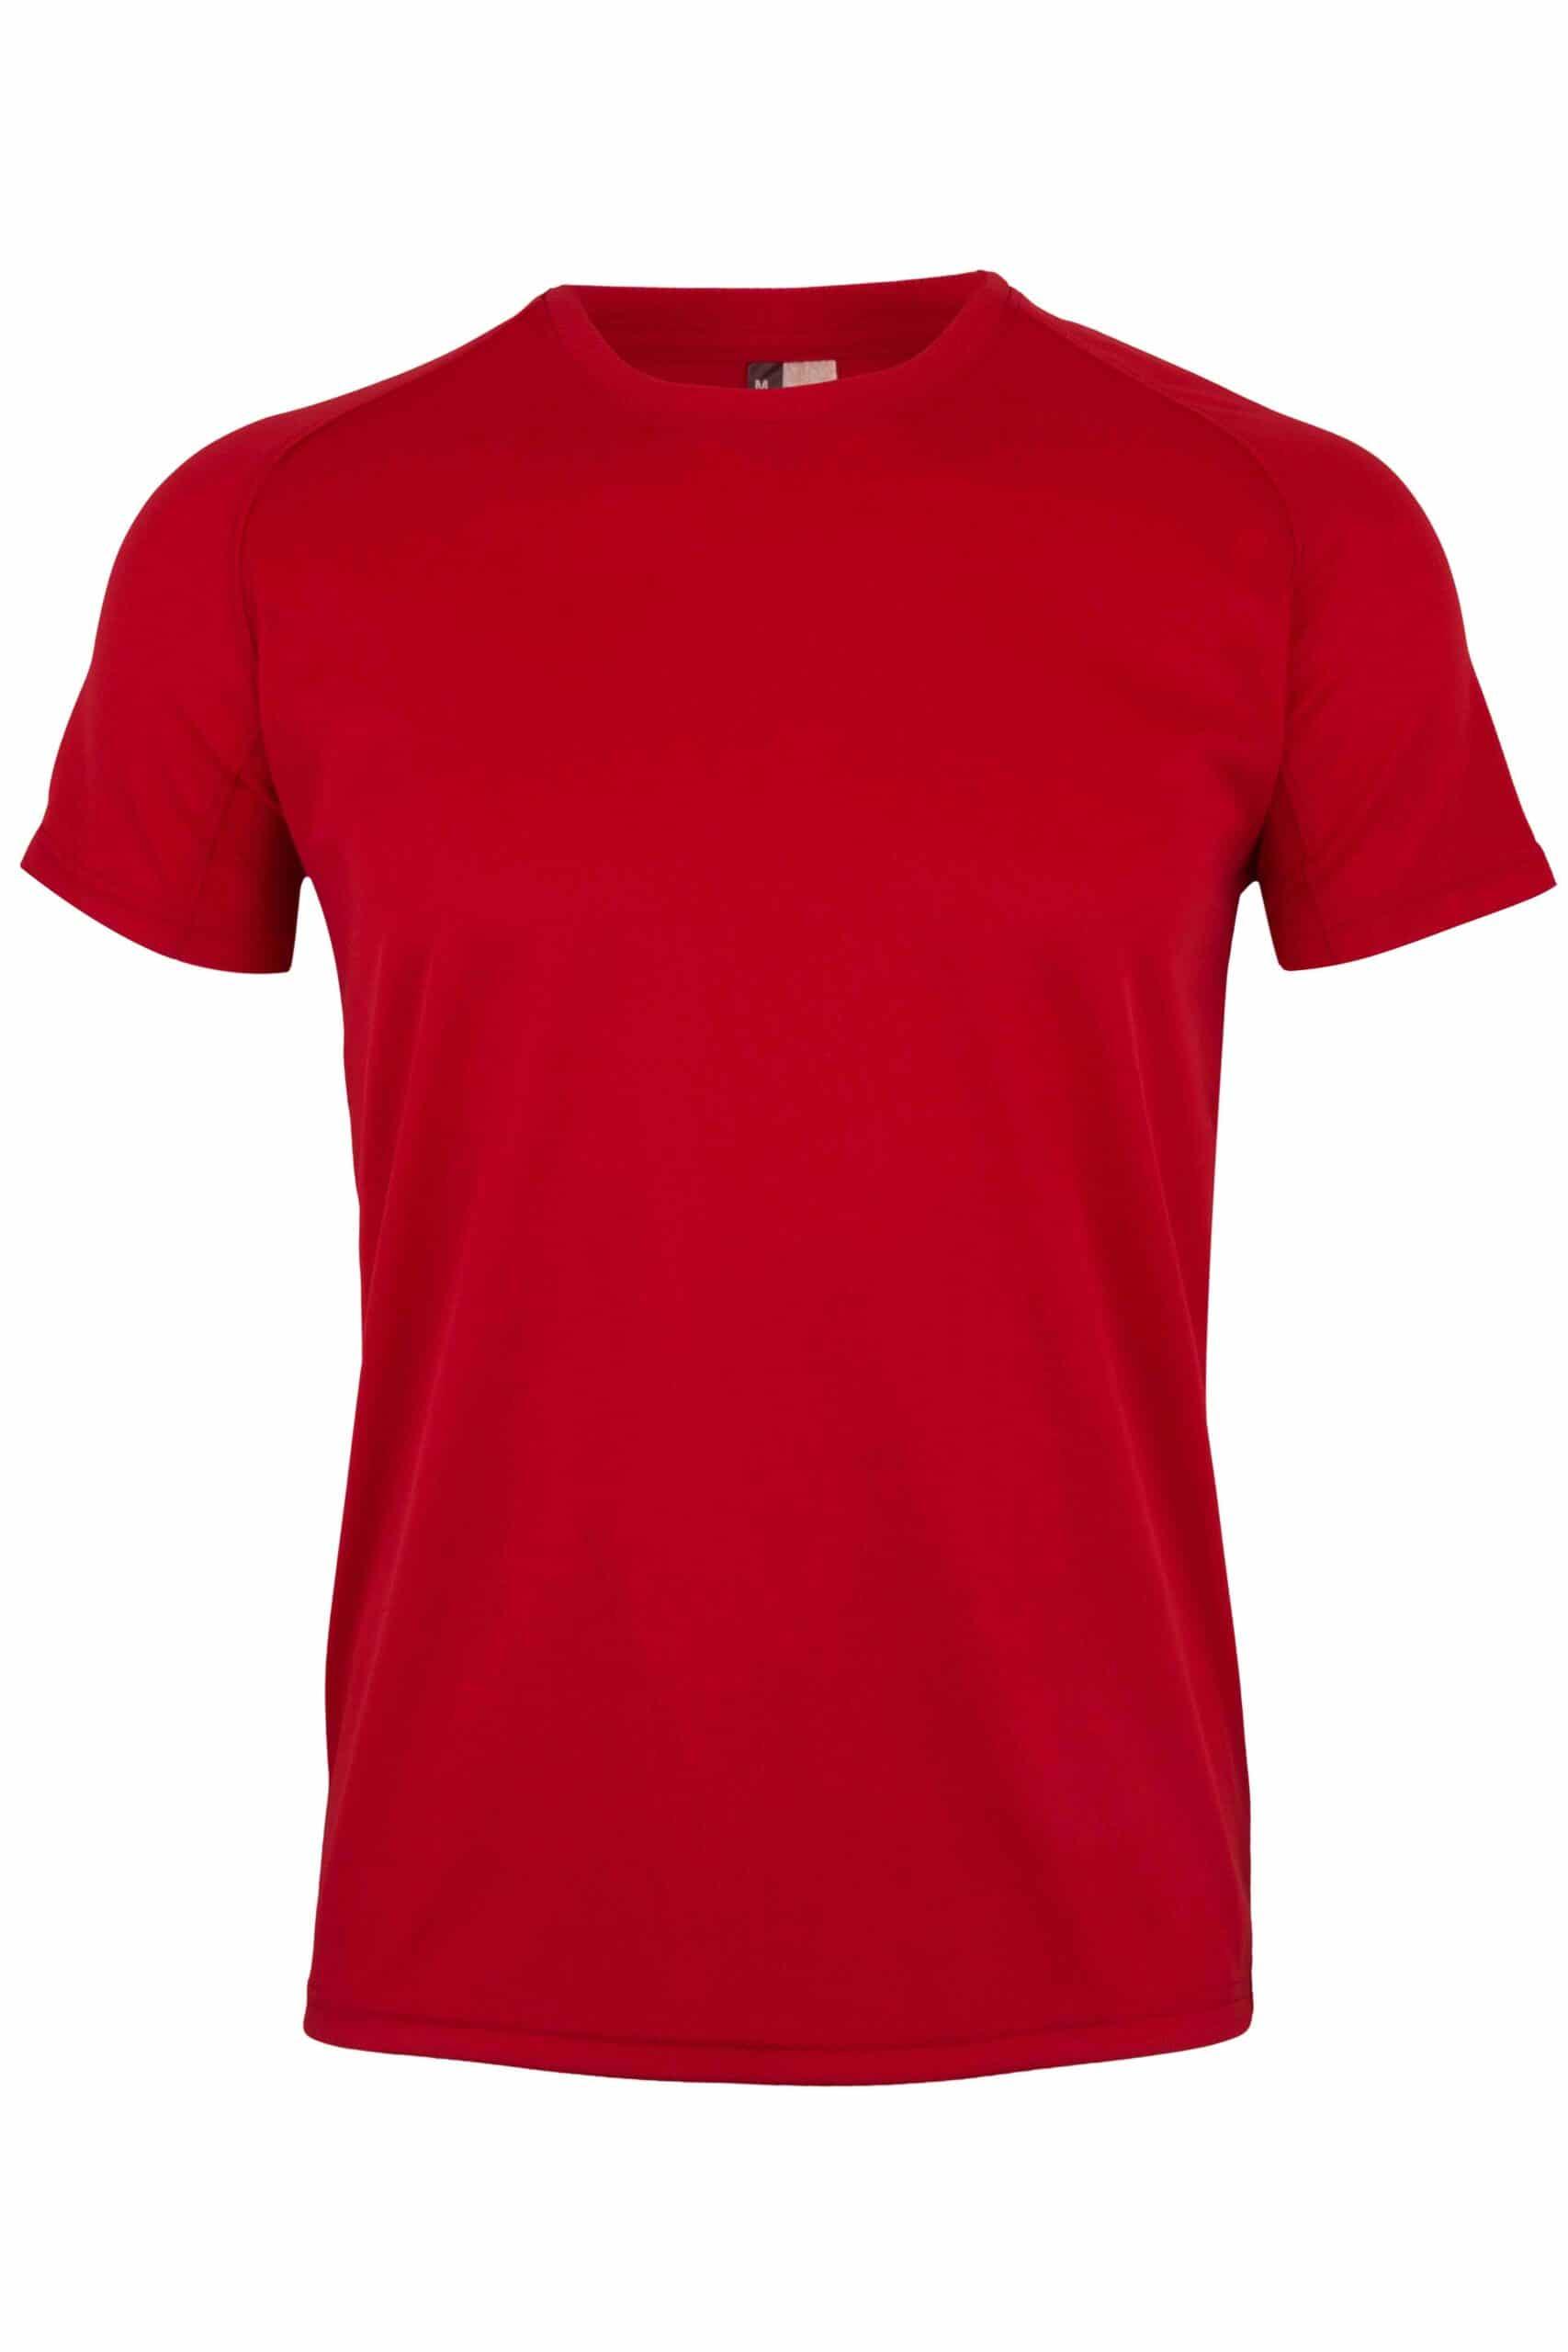 Mukua Mk521v Camiseta TÉcnica Manga Corta NiÑo Red